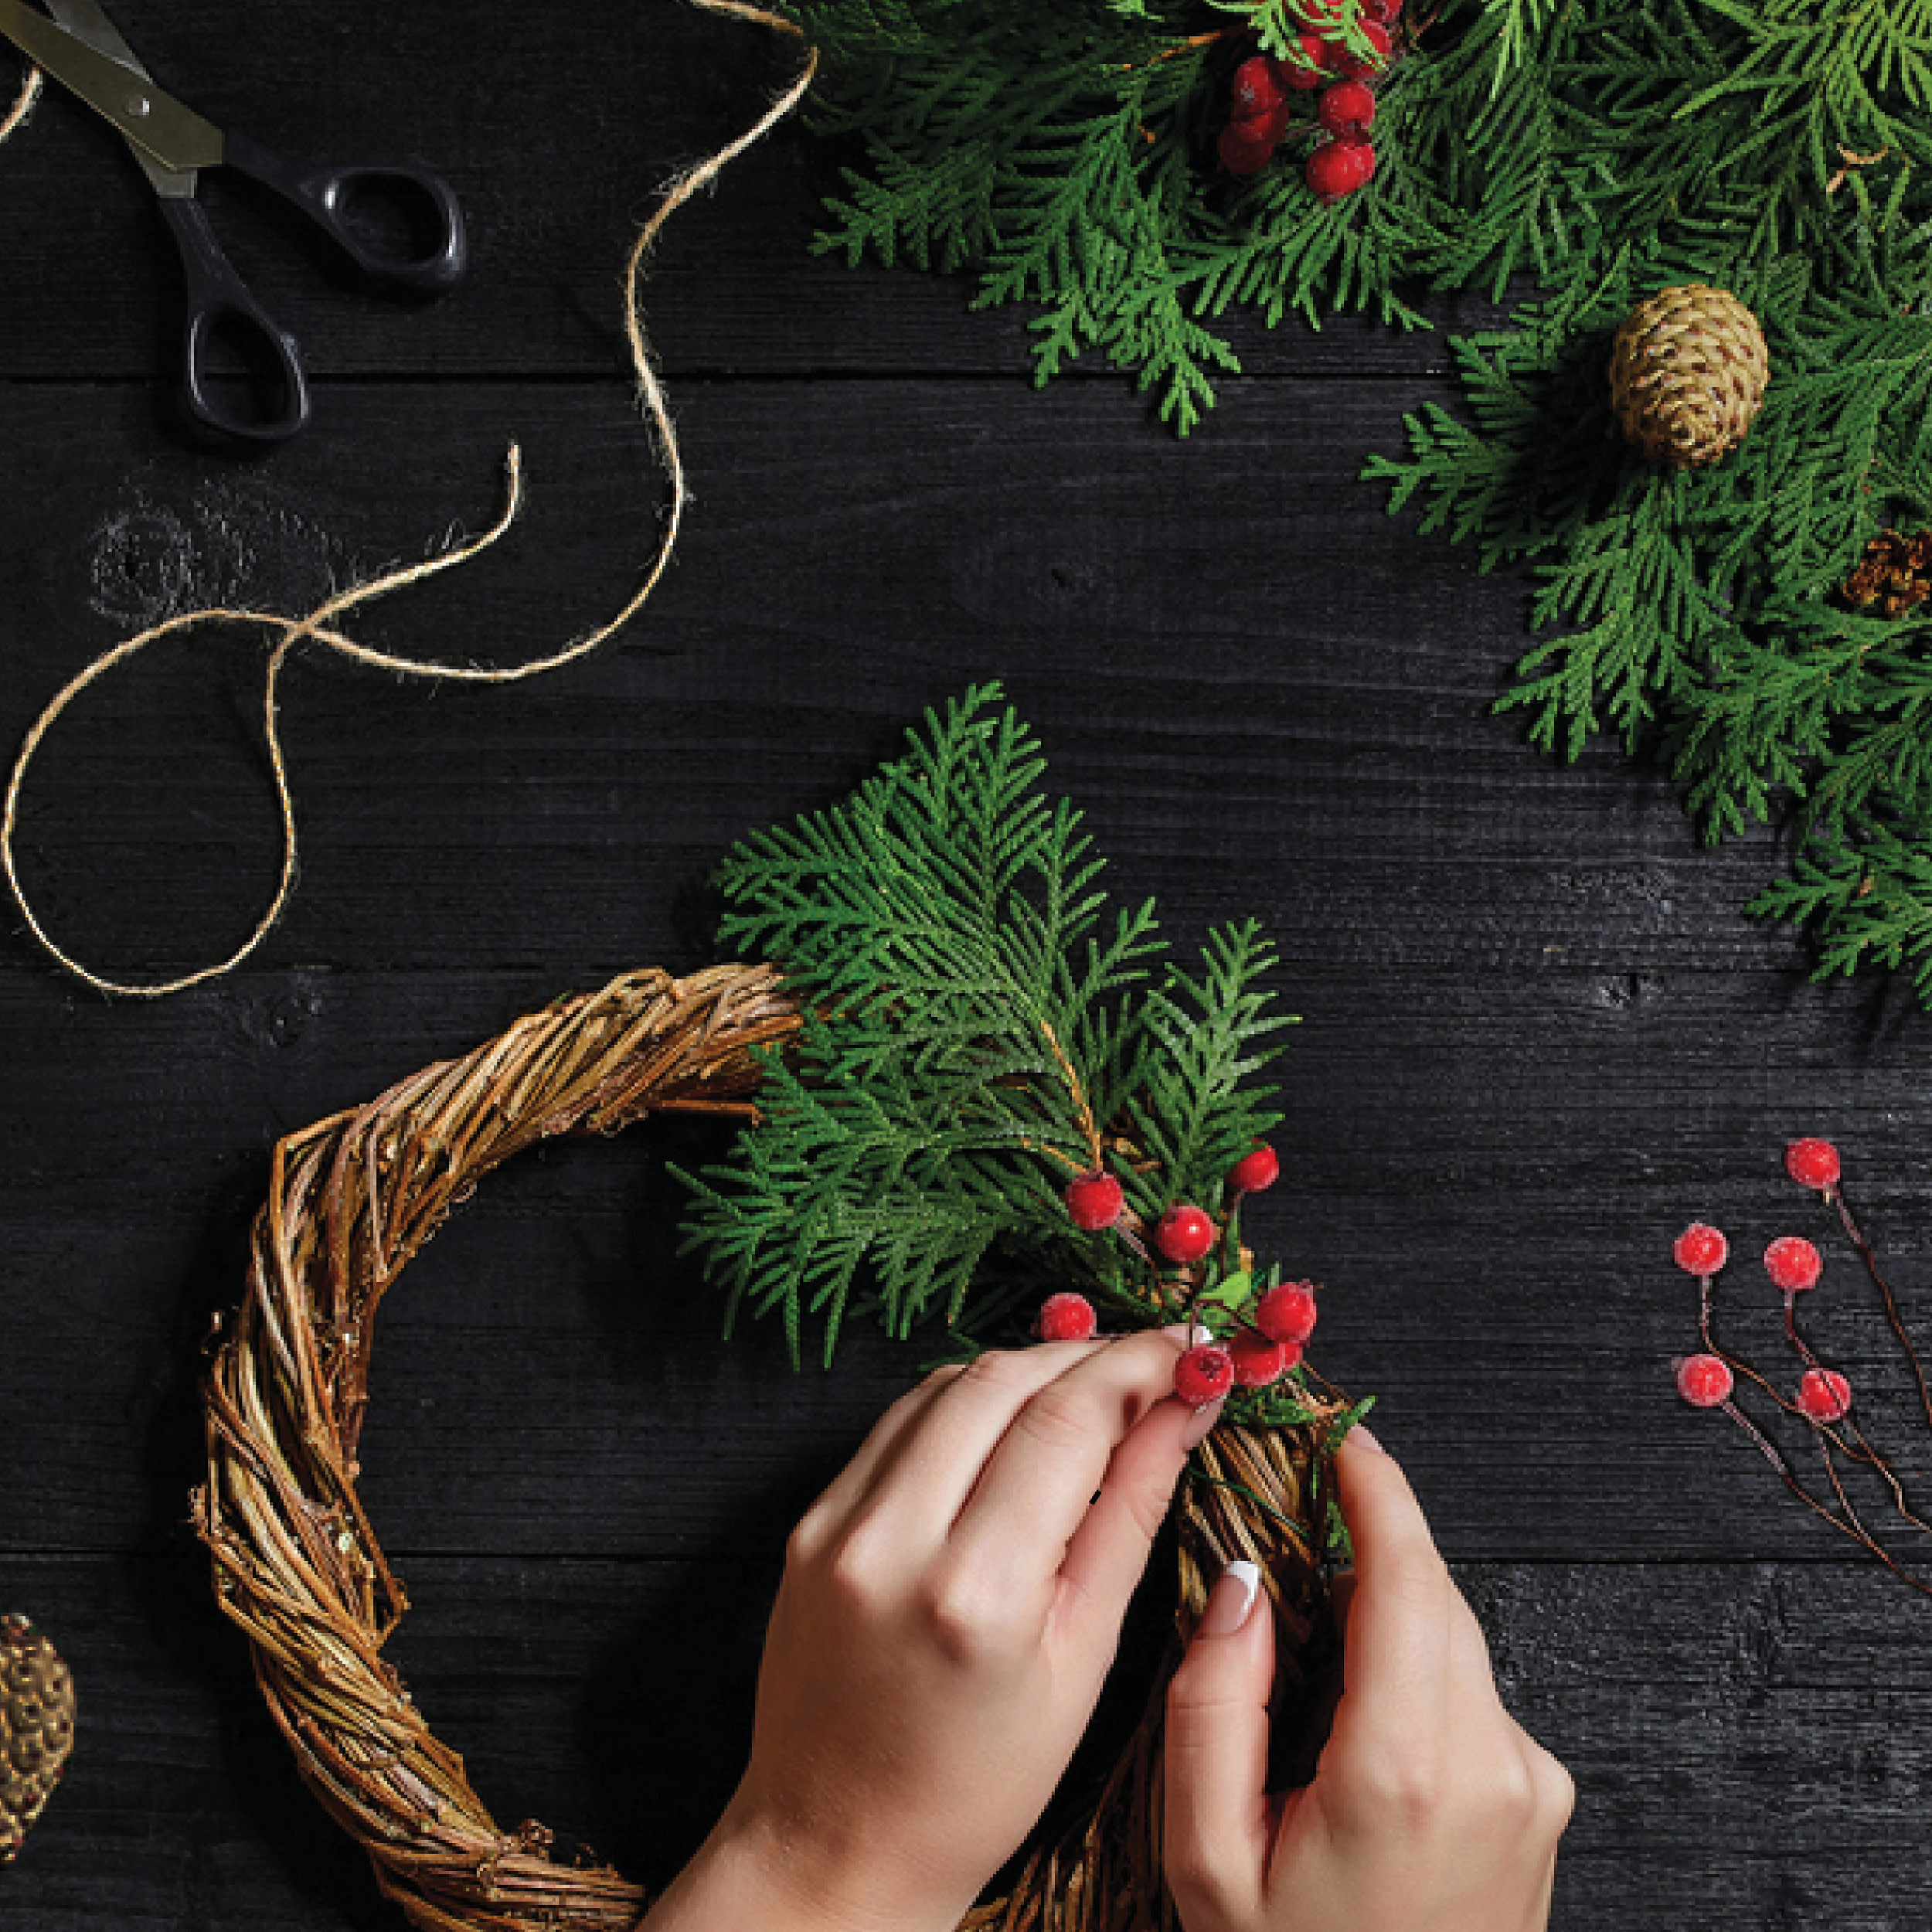 Christmas Wreath Making at Restoration Yard